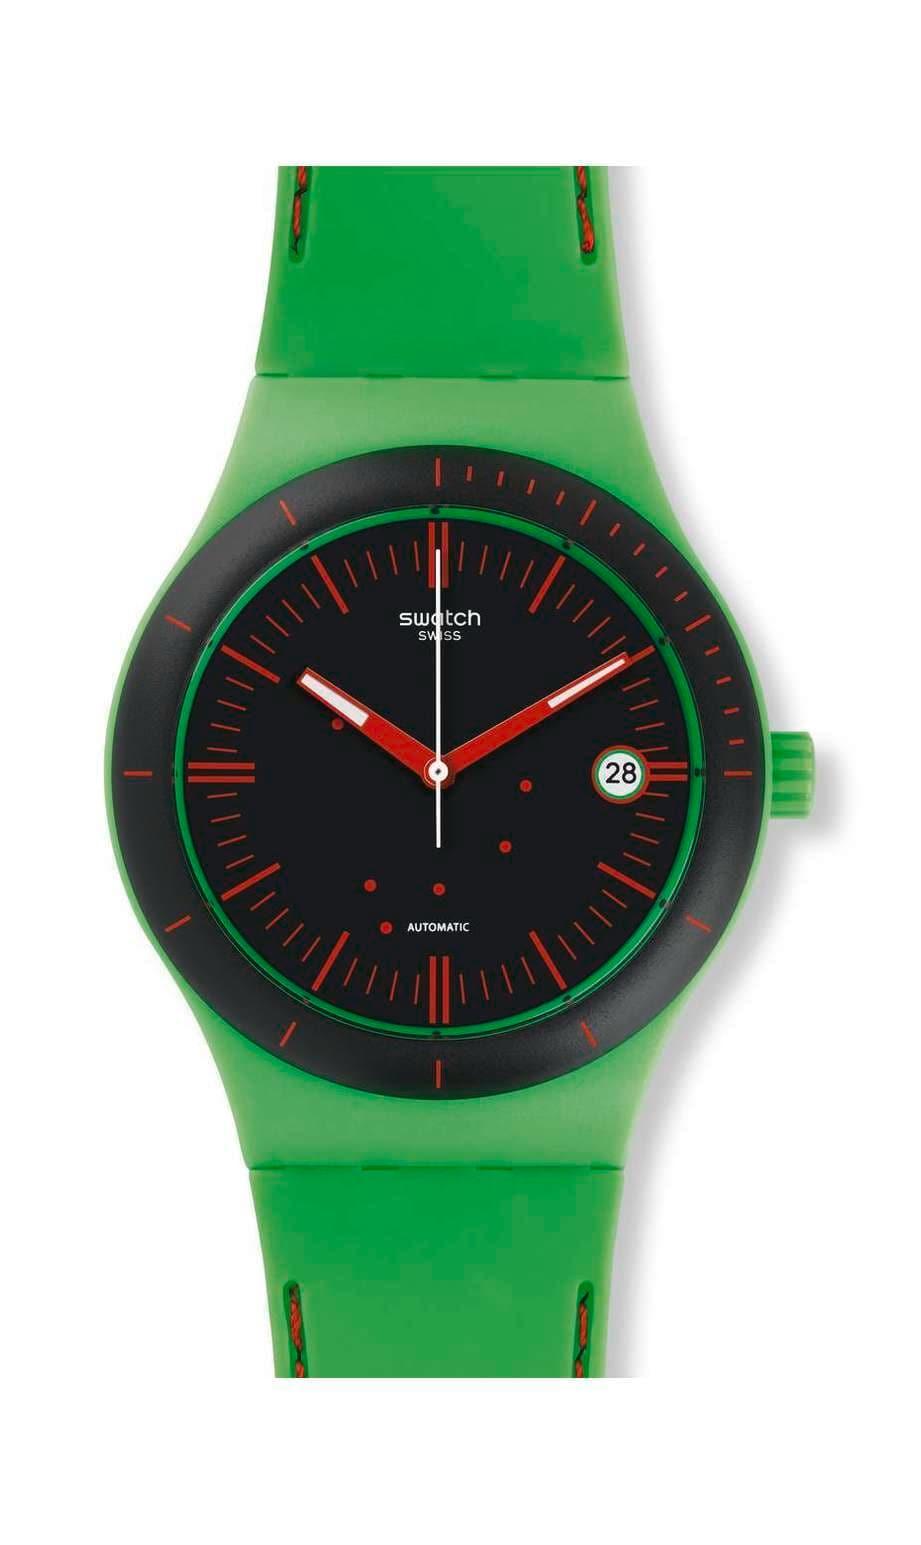 Swatch - SISTEM FROG - 1